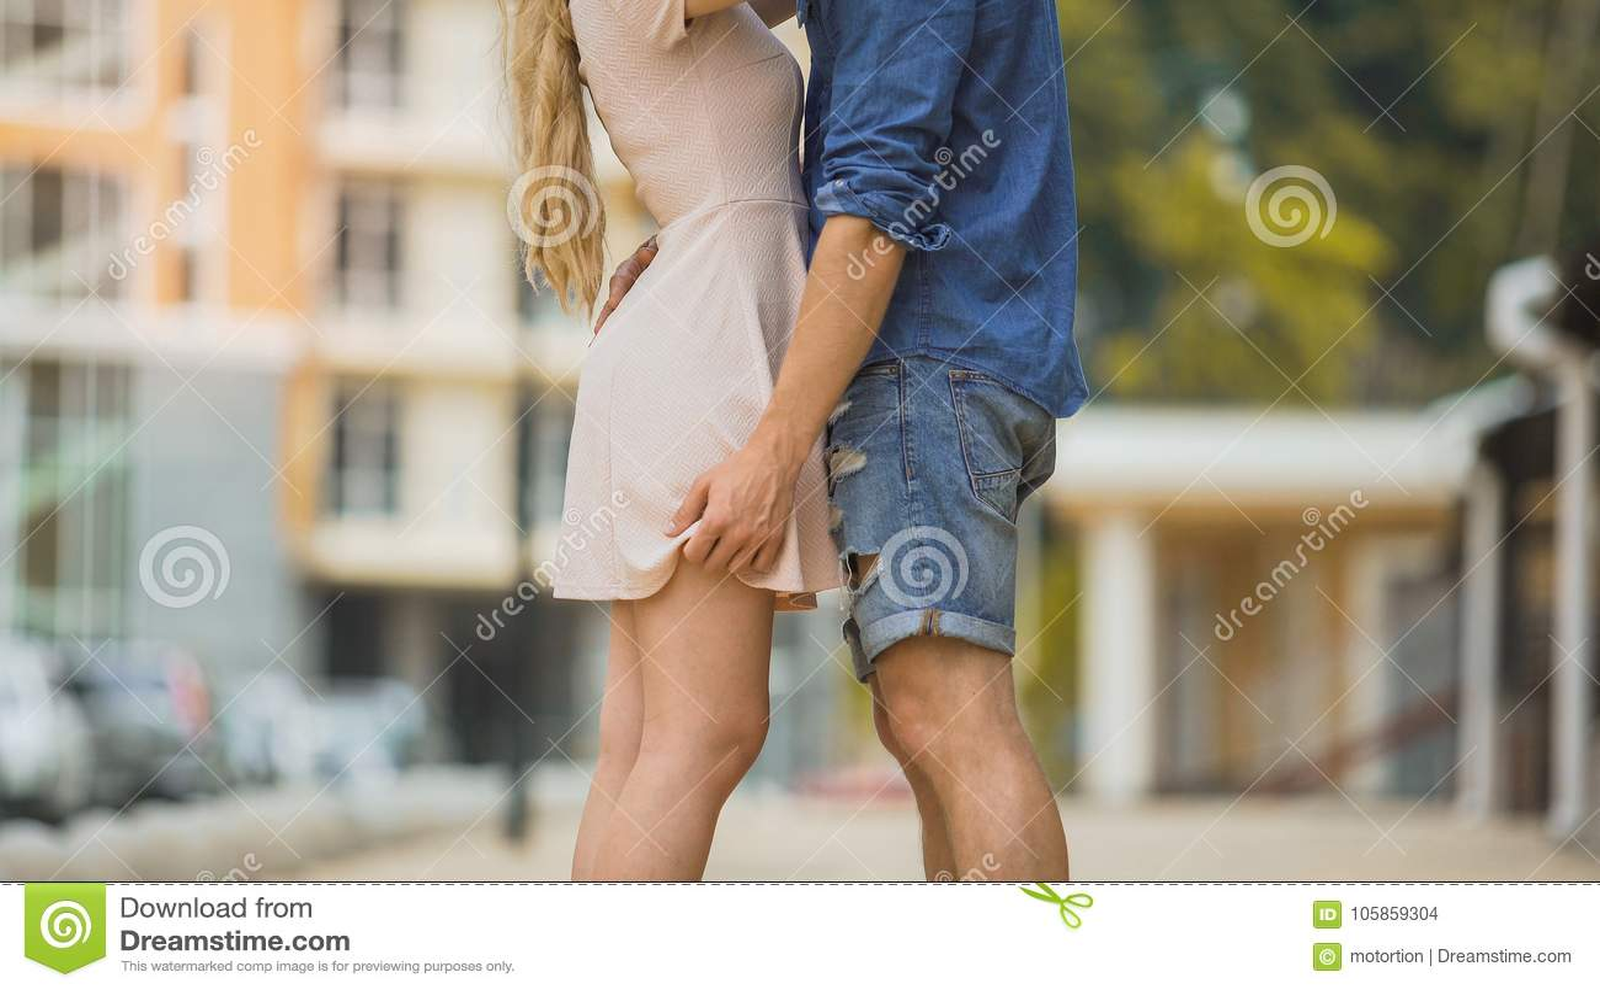 Paar die passionately in stadsstraat omhelzen, tedere verhouding, veilig geslacht